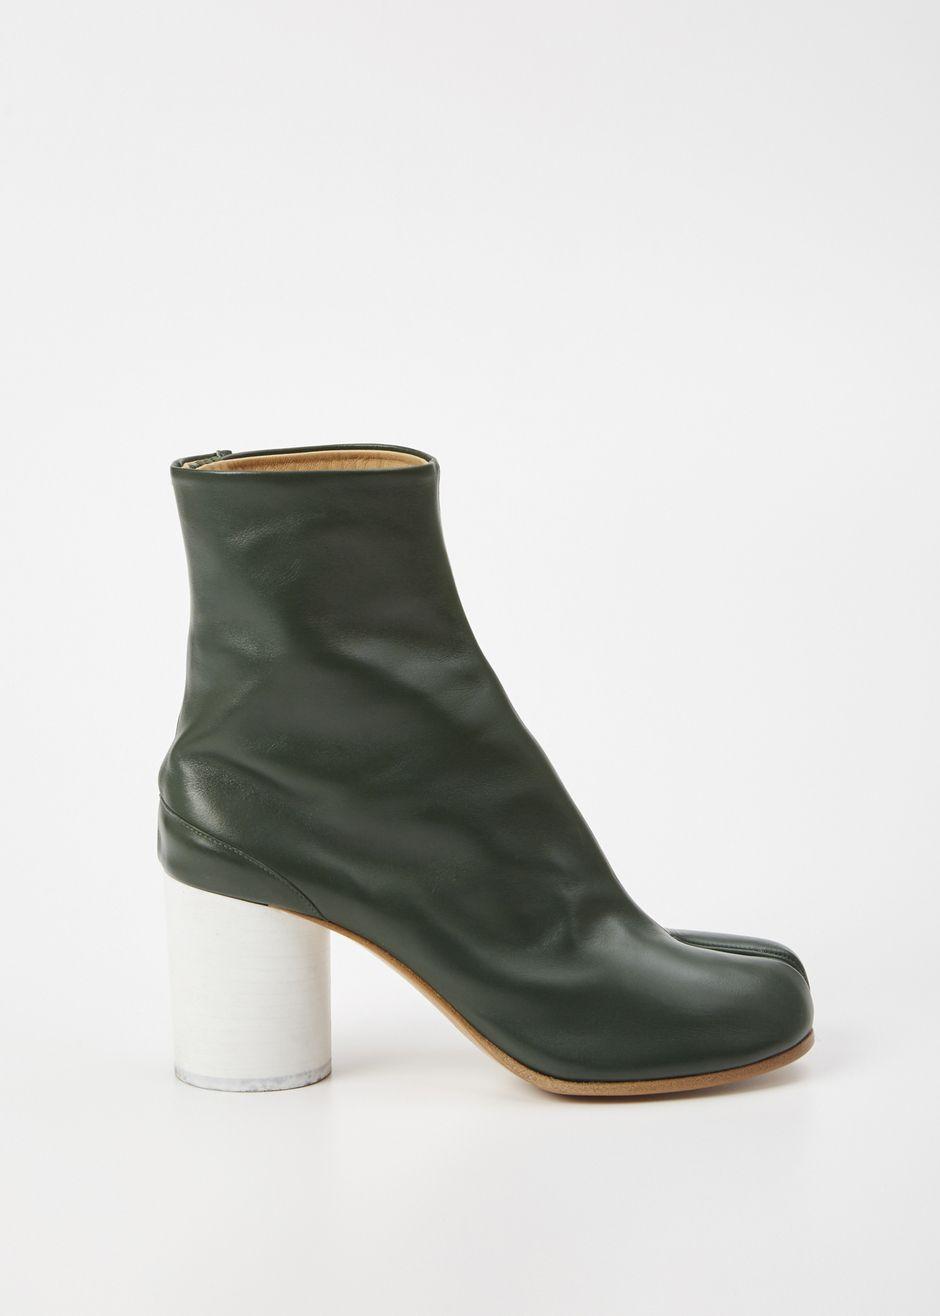 Totokaelo - Maison Margiela Green Tabi Boot - $386.00